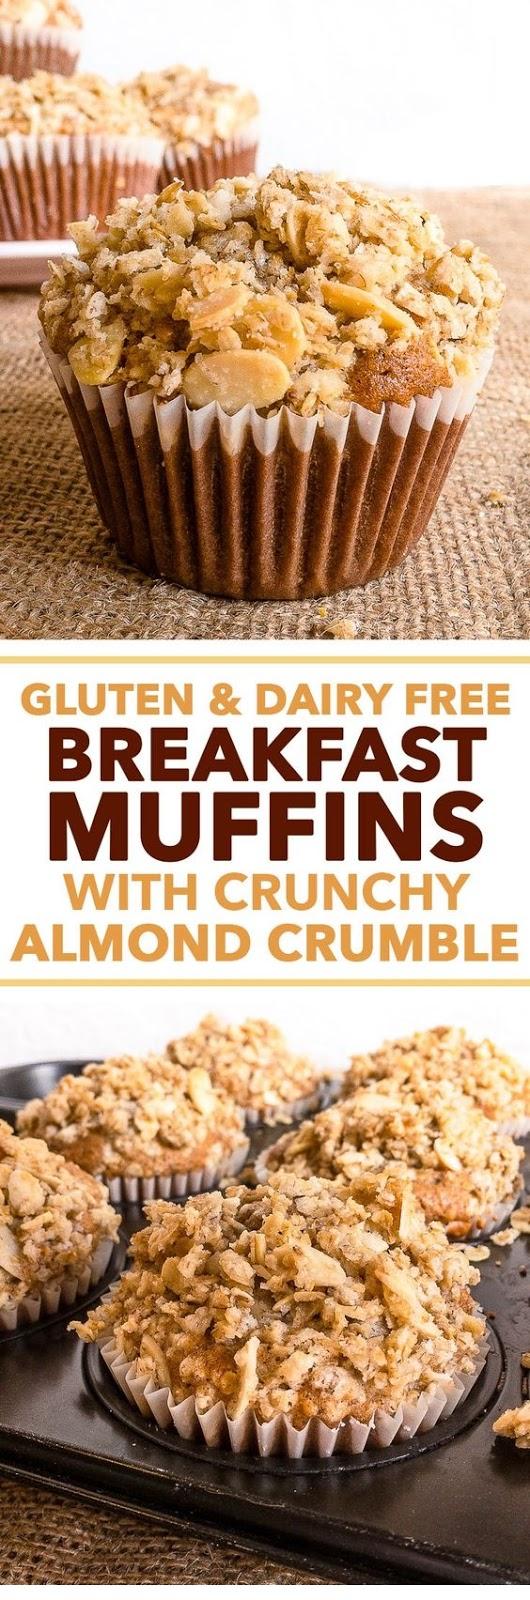 Gluten & Dairy Free Breakfast Muffins With Crunchy Almond Crumble